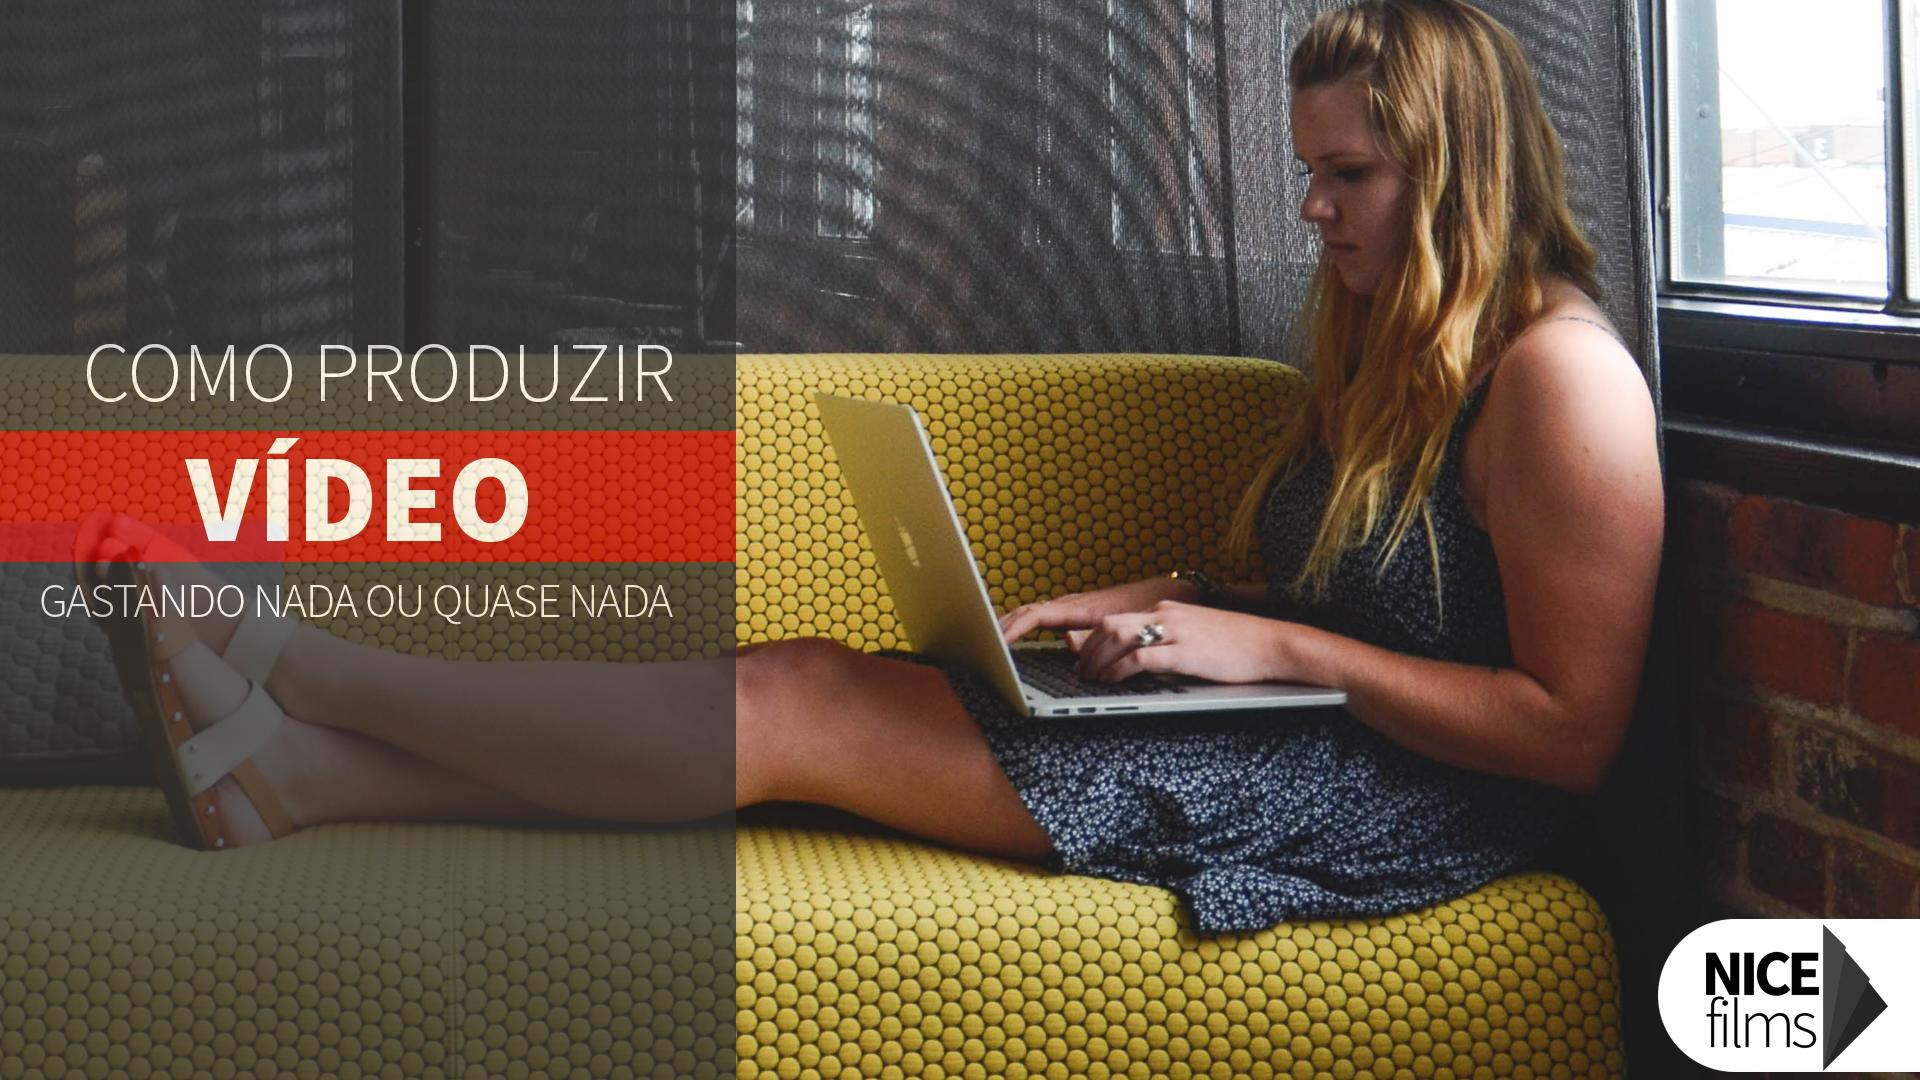 Produza vídeo para sua marca